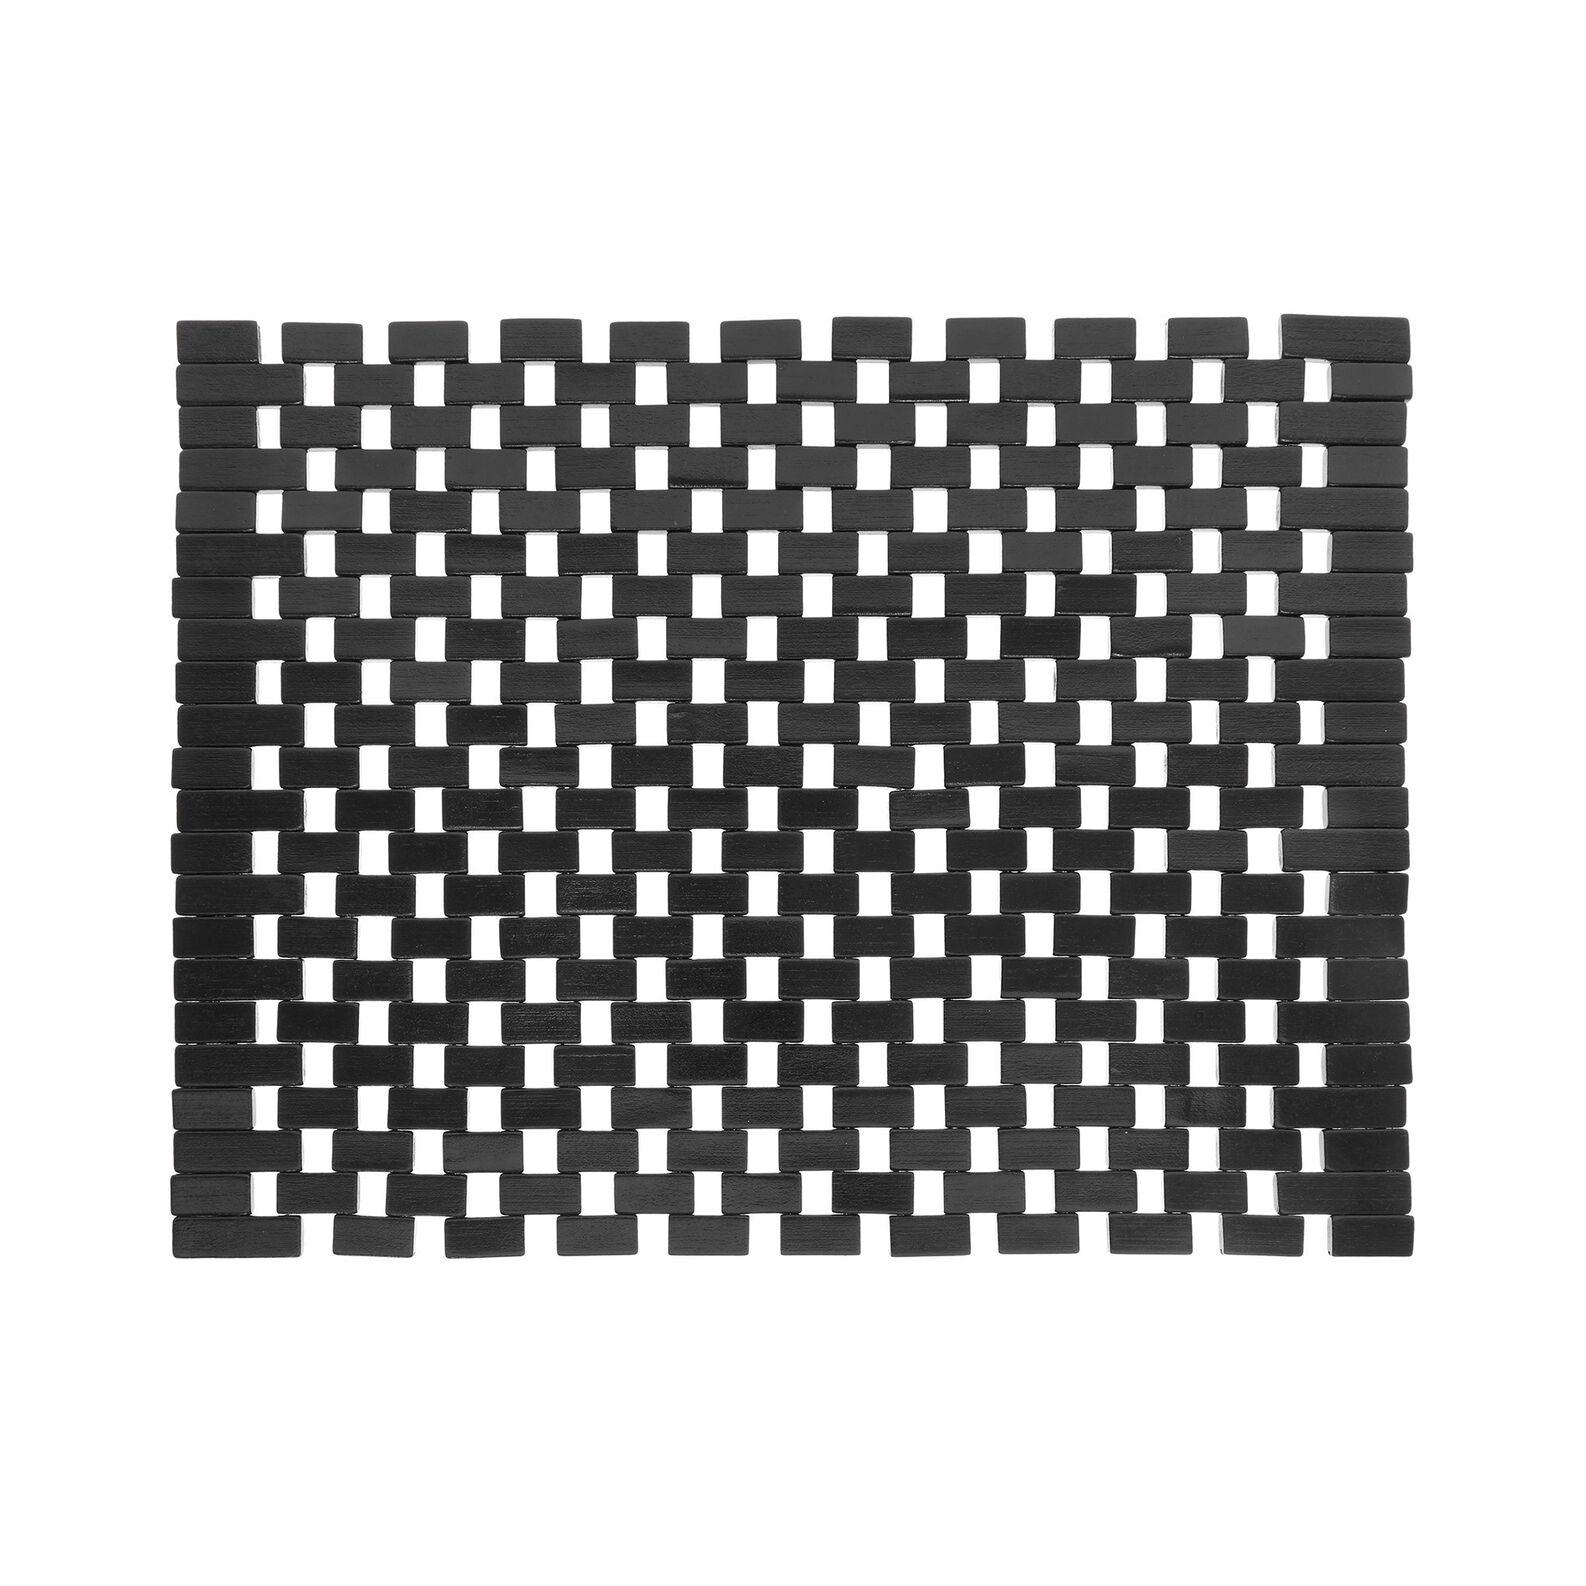 Woven bamboo table mat